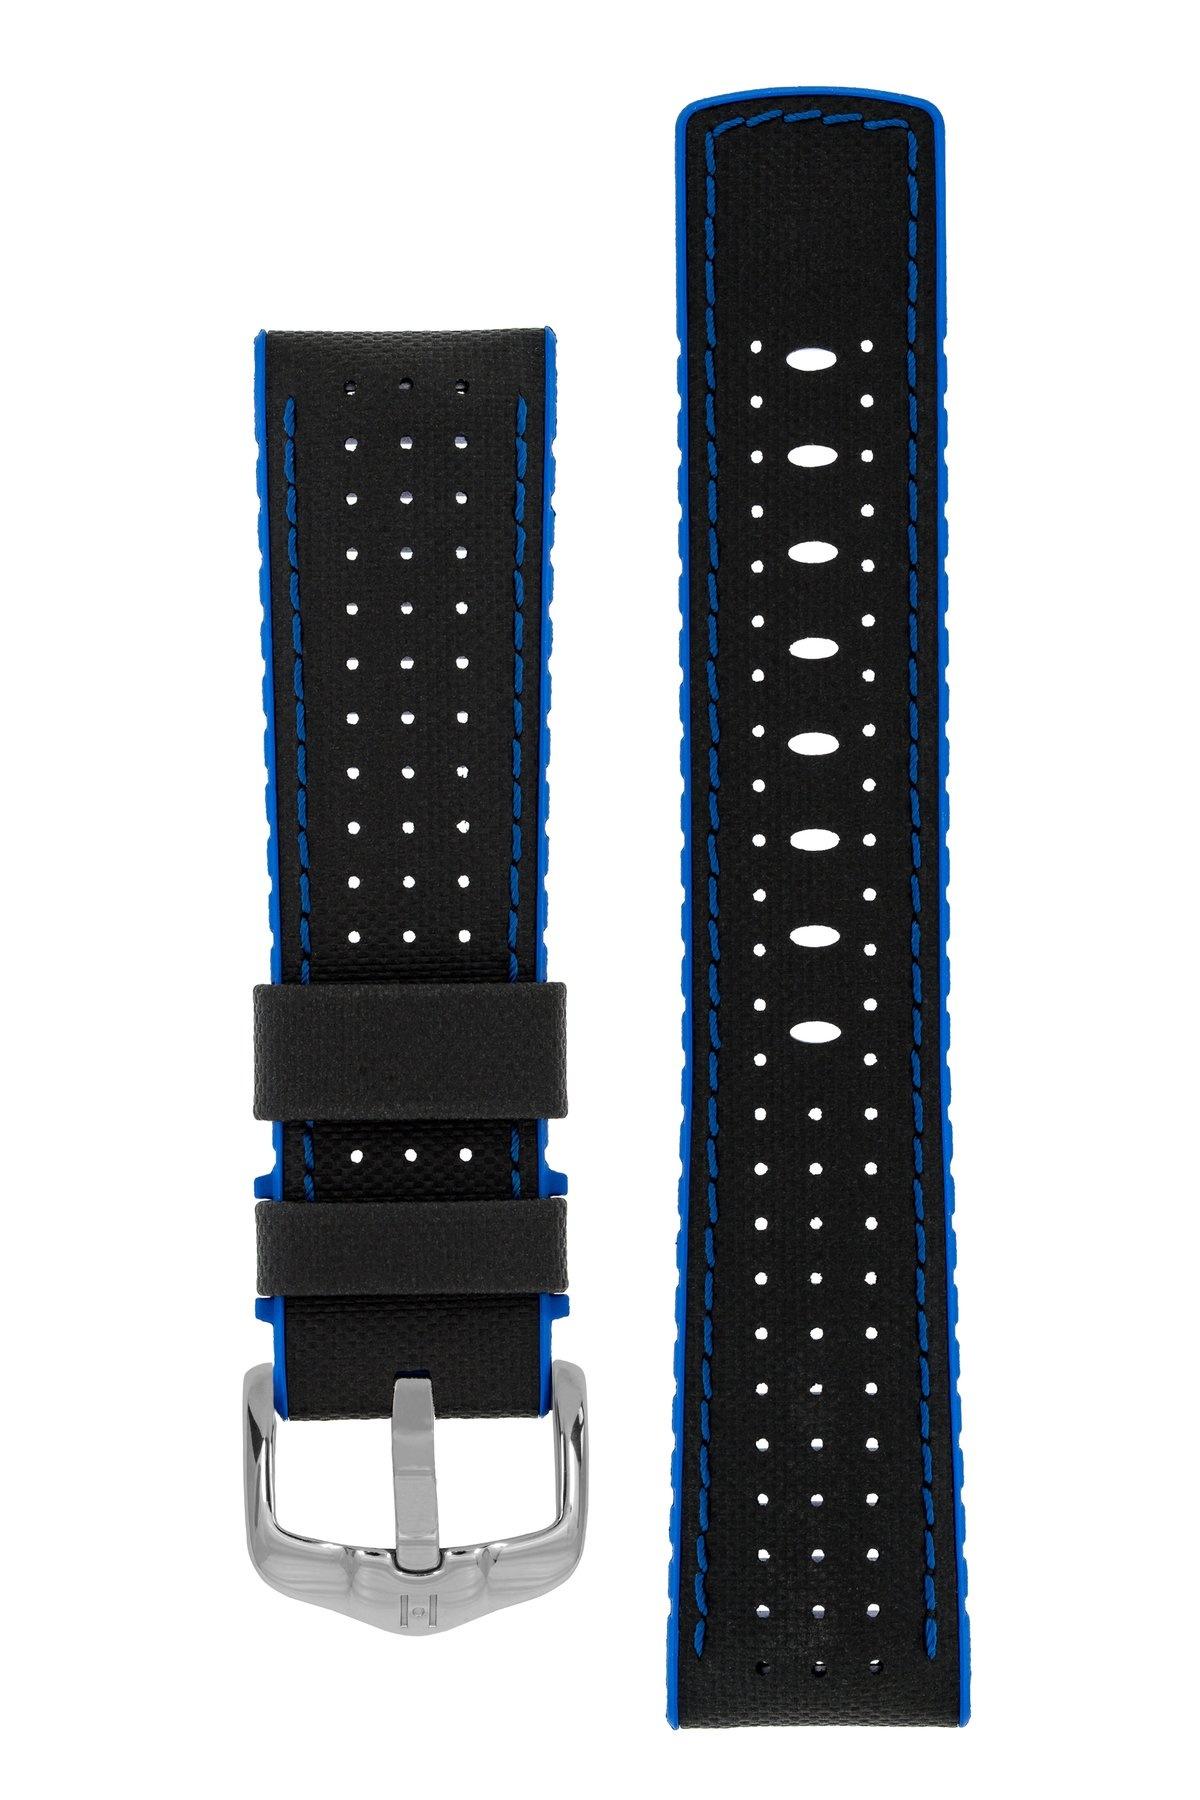 Horlogebandje Robby Kalfsleer + Premium Rubber 24 mm-2